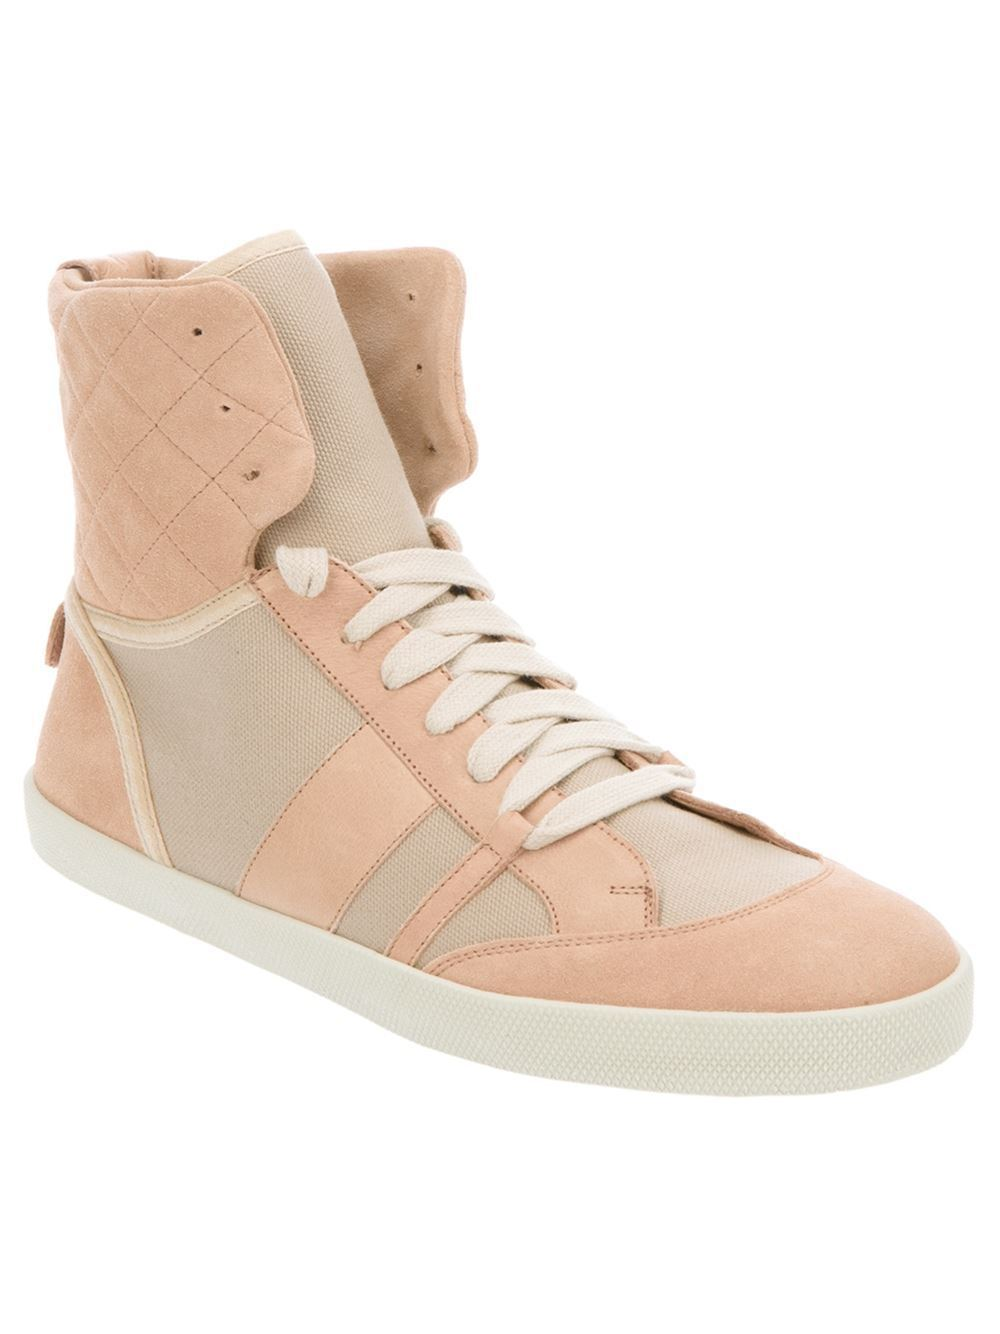 NIB DONNE CHLOE SUEDE CORAL  HI -TOP scarpe da ginnastica EU 41 US 11 100% AUTHENTIC  595  outlet online